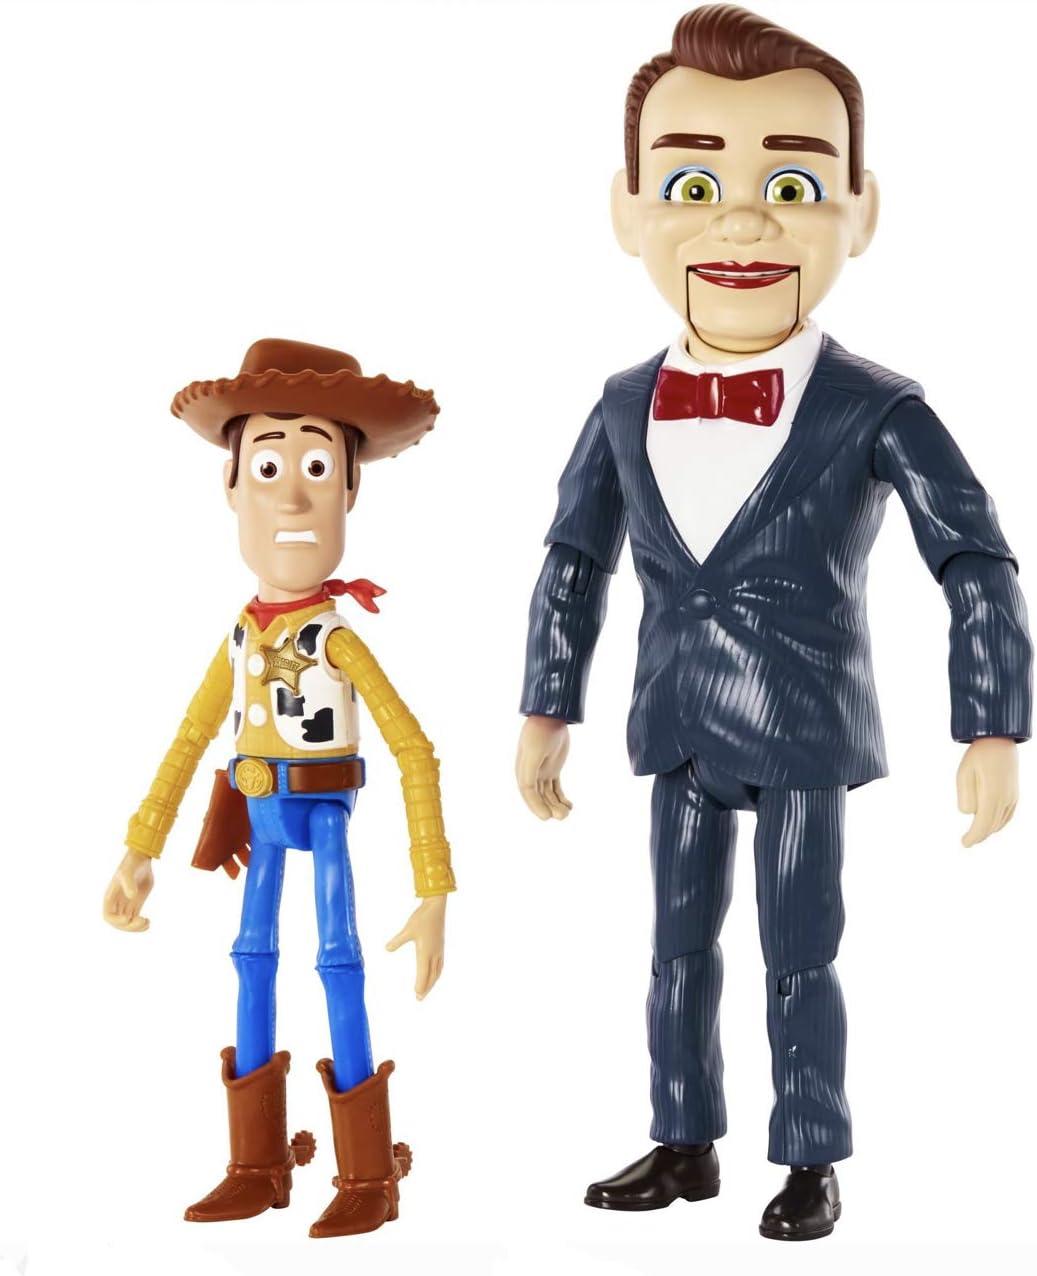 Disney Pixar Toy Story Benson and Woody Figure 2-Pack: Amazon.es ...